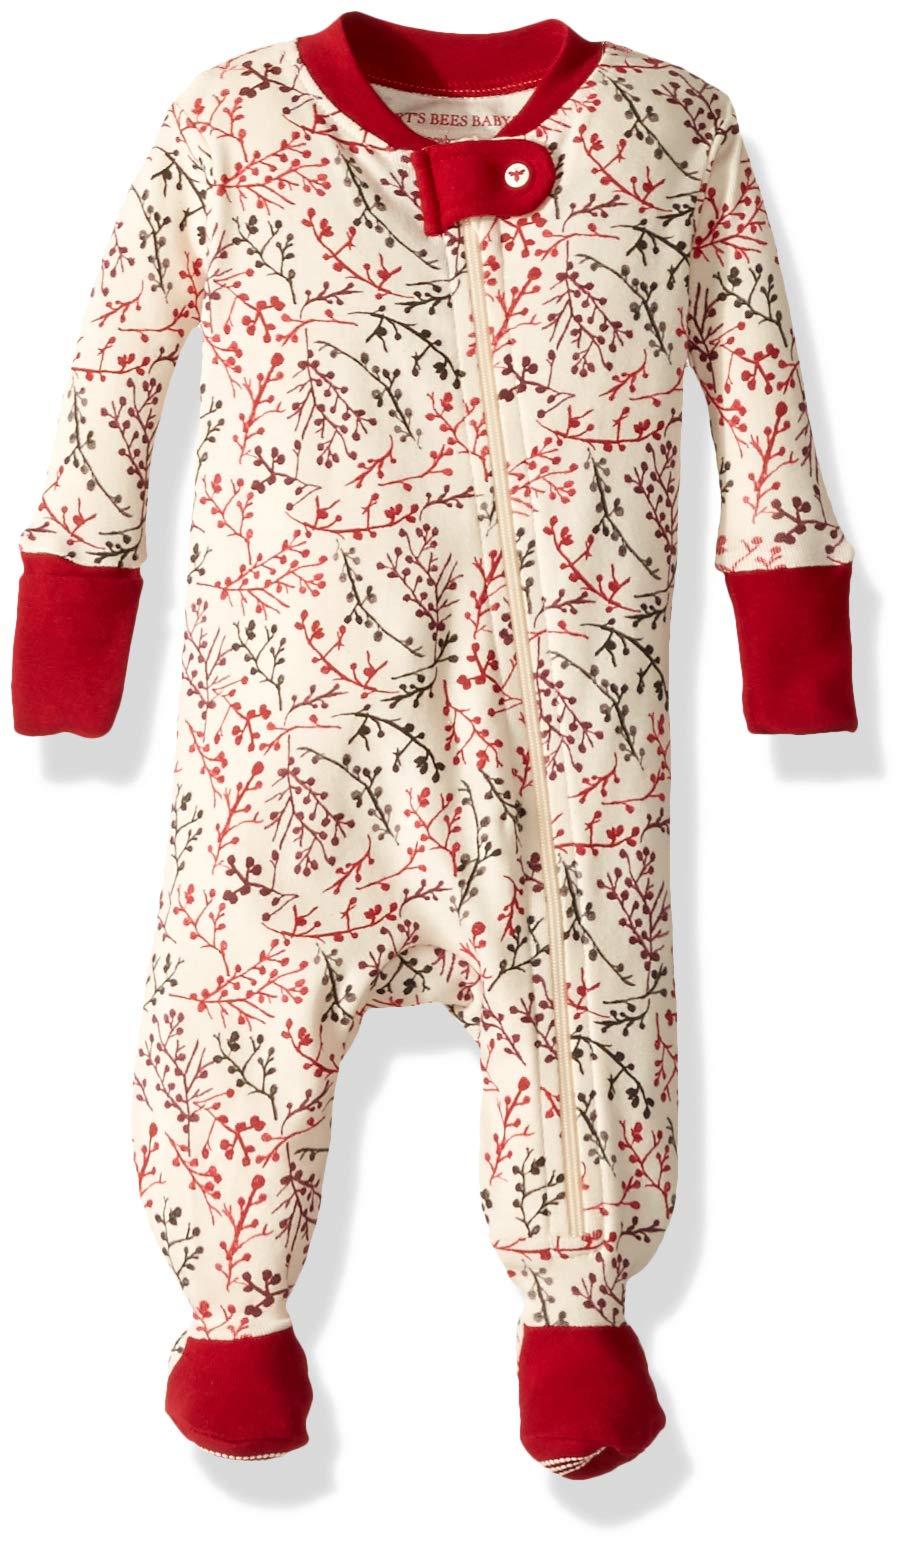 Zip Front Non-Slip Footed Sleeper Pjs 100/% Organic Cotton Sleepers Burts Bees Baby-Boys Sleeper Pajamas